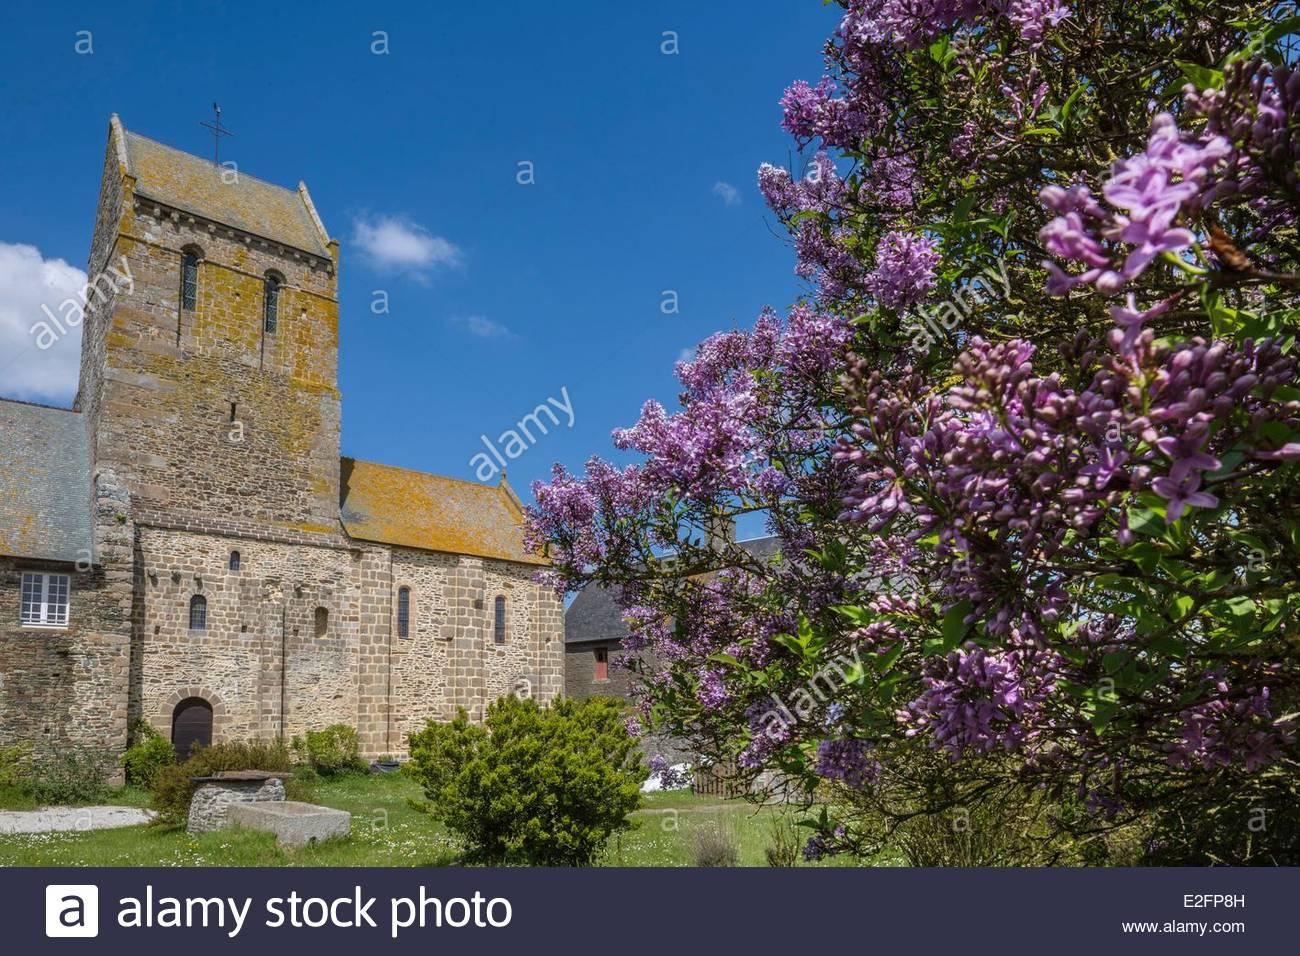 France Manche Vains Saint Leonard priory - Stock Image